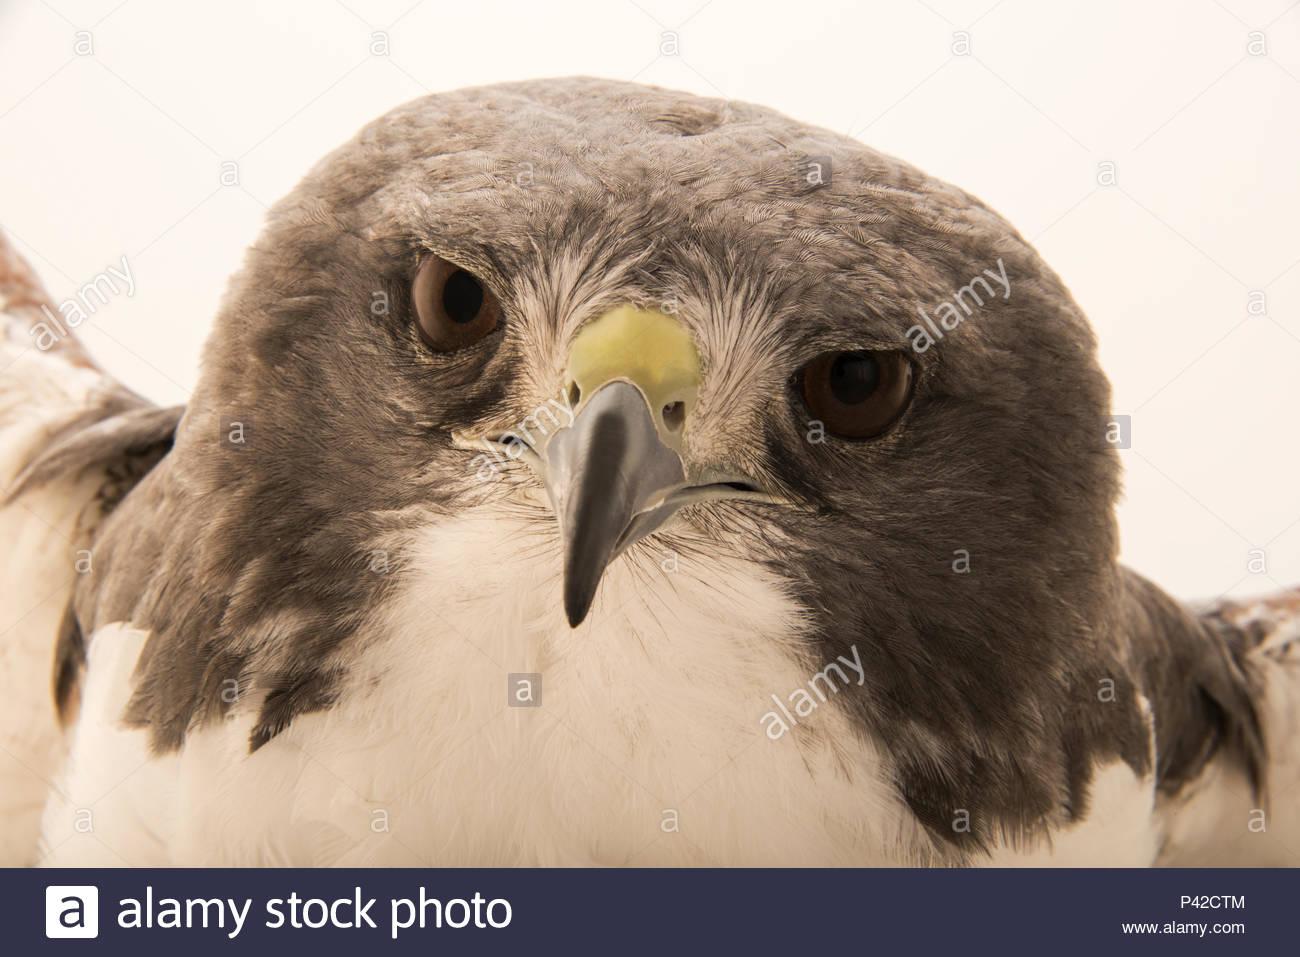 A white tailed hawk, Geranoaetus albicaudatus hypospodius, at SIA, the Comanche Nation Ethno-Ornithological Initiative. - Stock Image